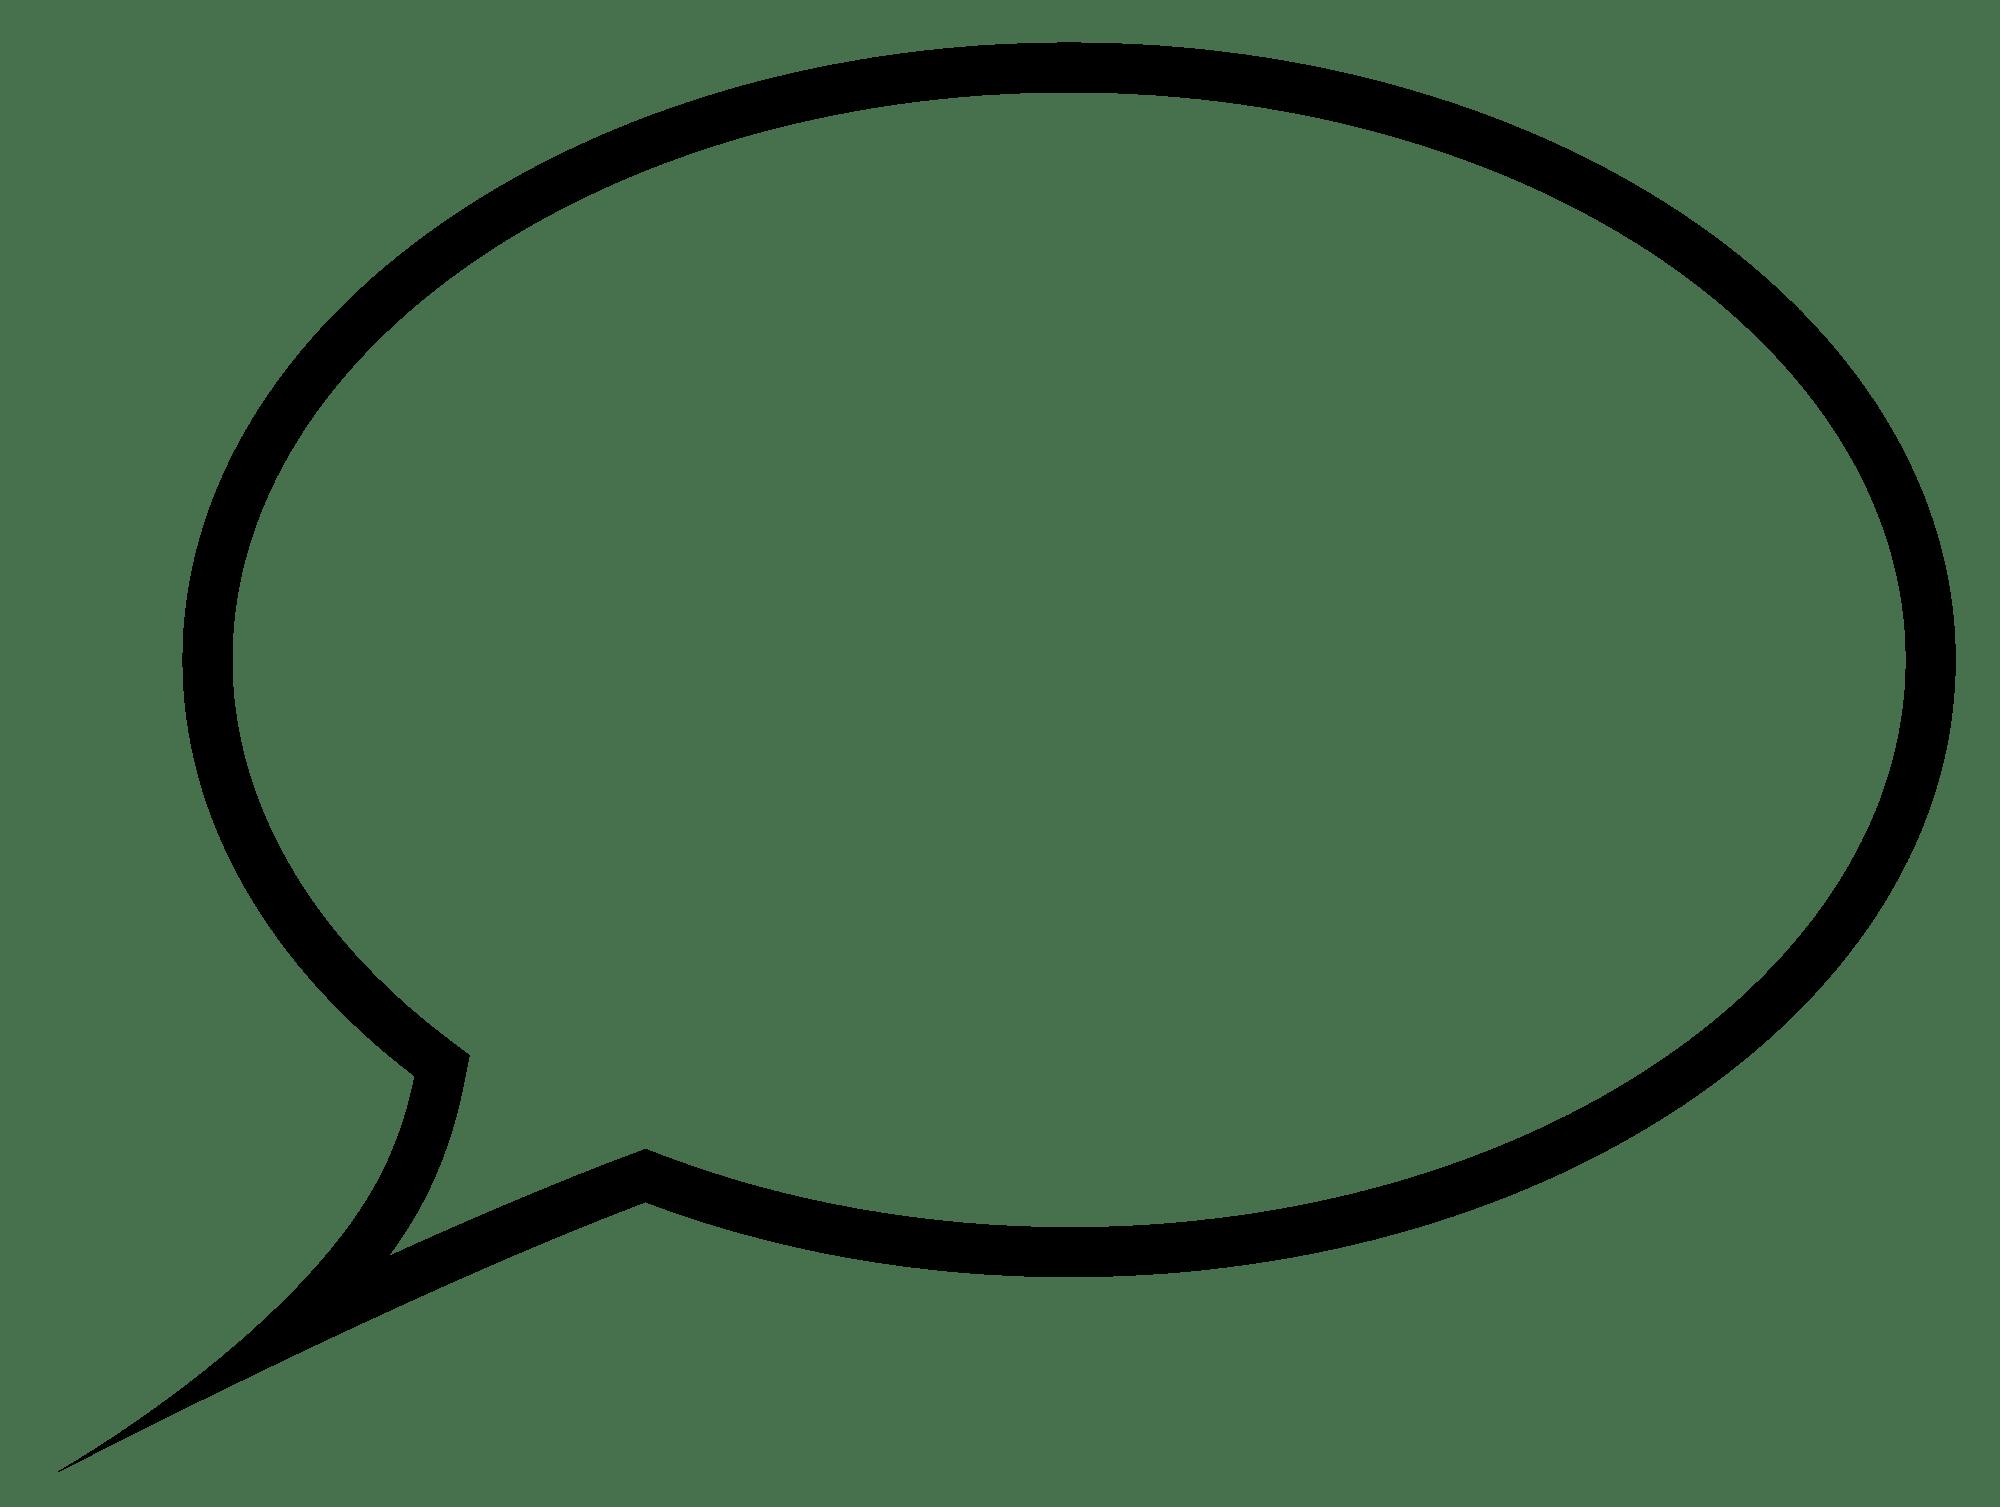 Download - Speech Bubble PNG